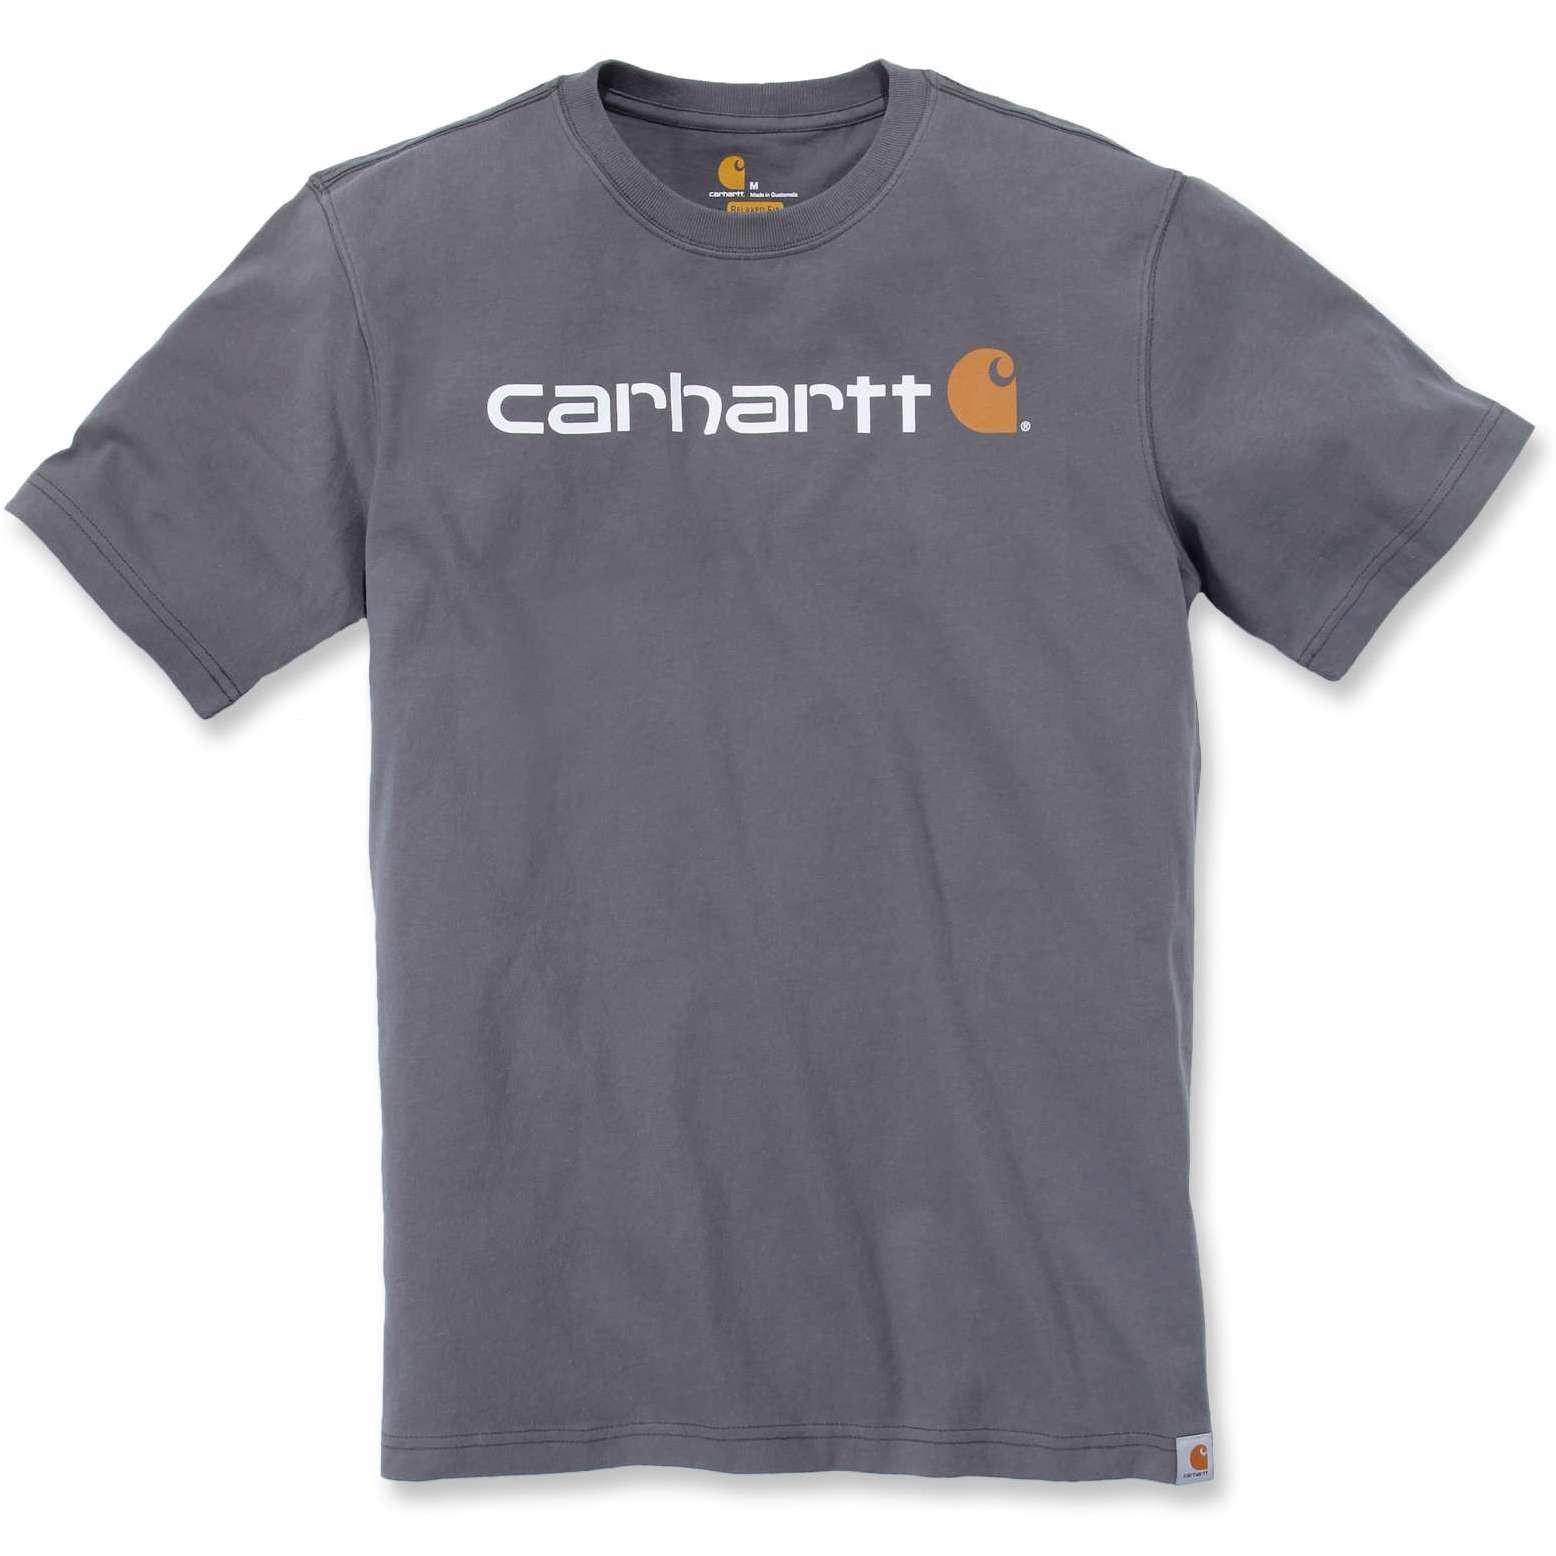 Футболка Carhartt Core Logo T-Shirt S/S - 103361 (Charcoal, XS)